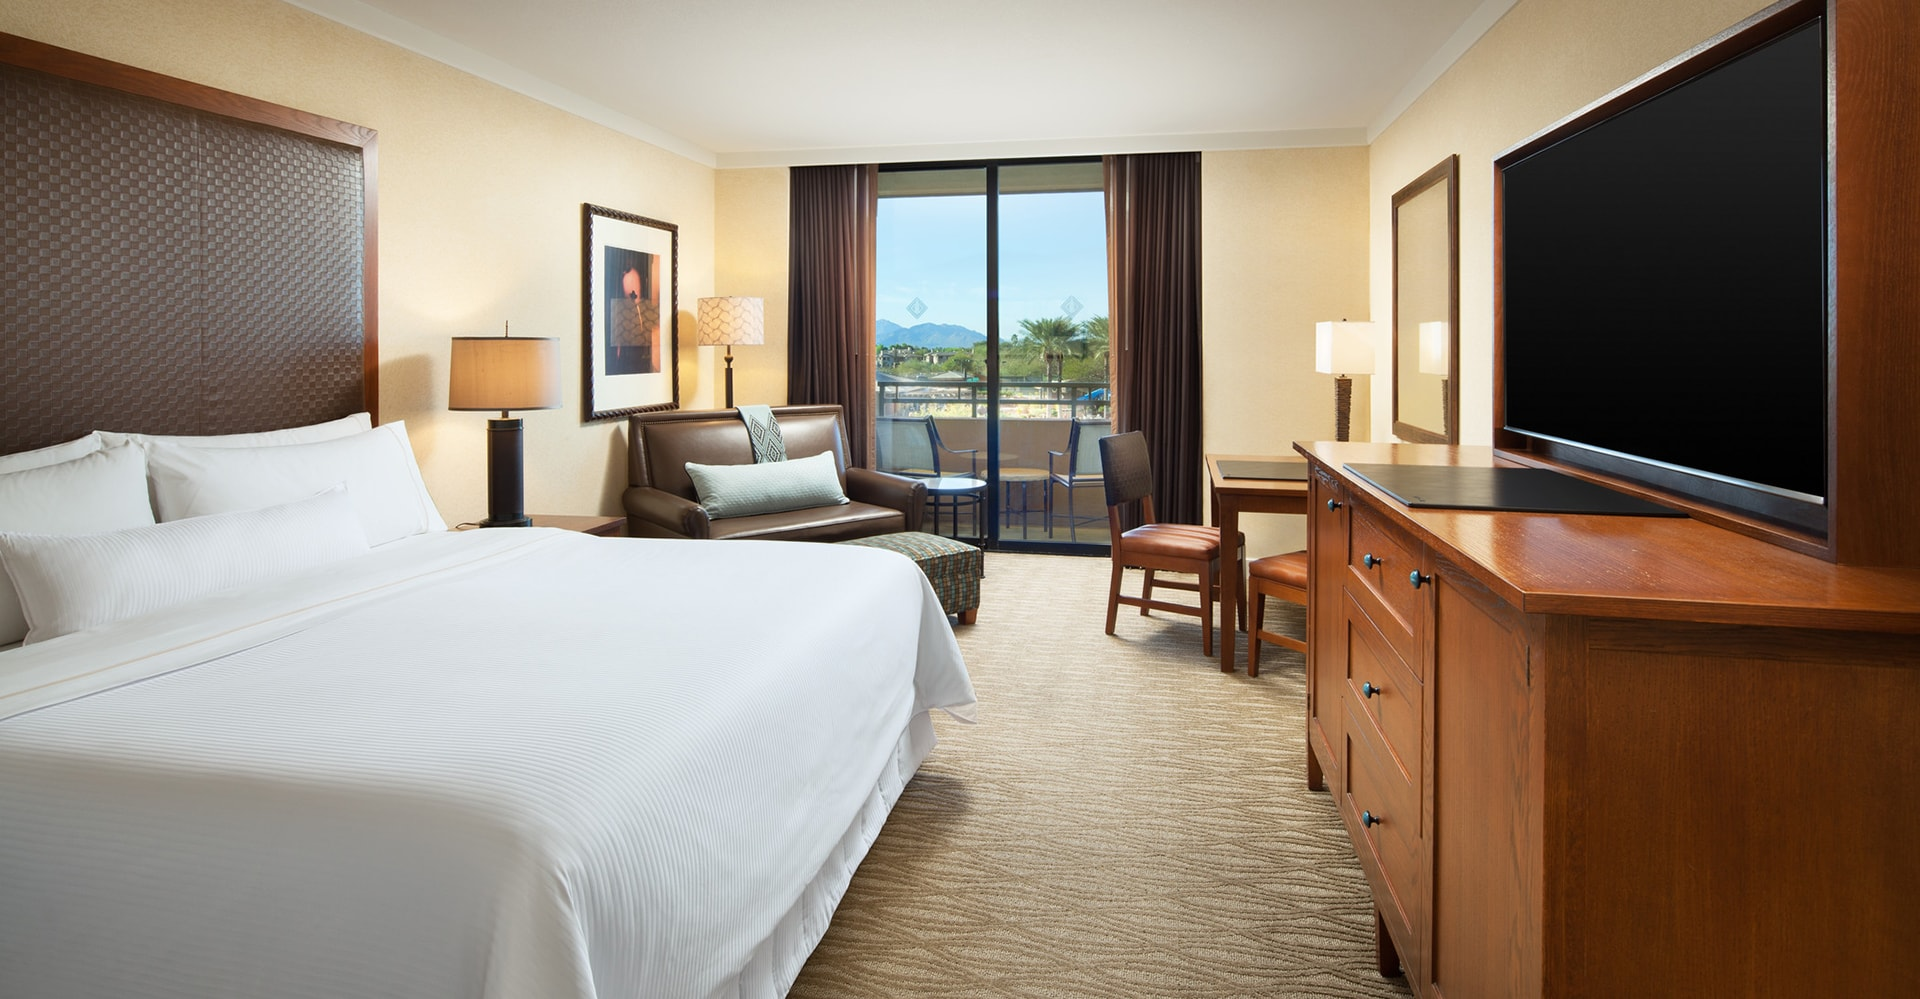 Kierland Westin Resort Guestrooms In Scottsdale Arizona